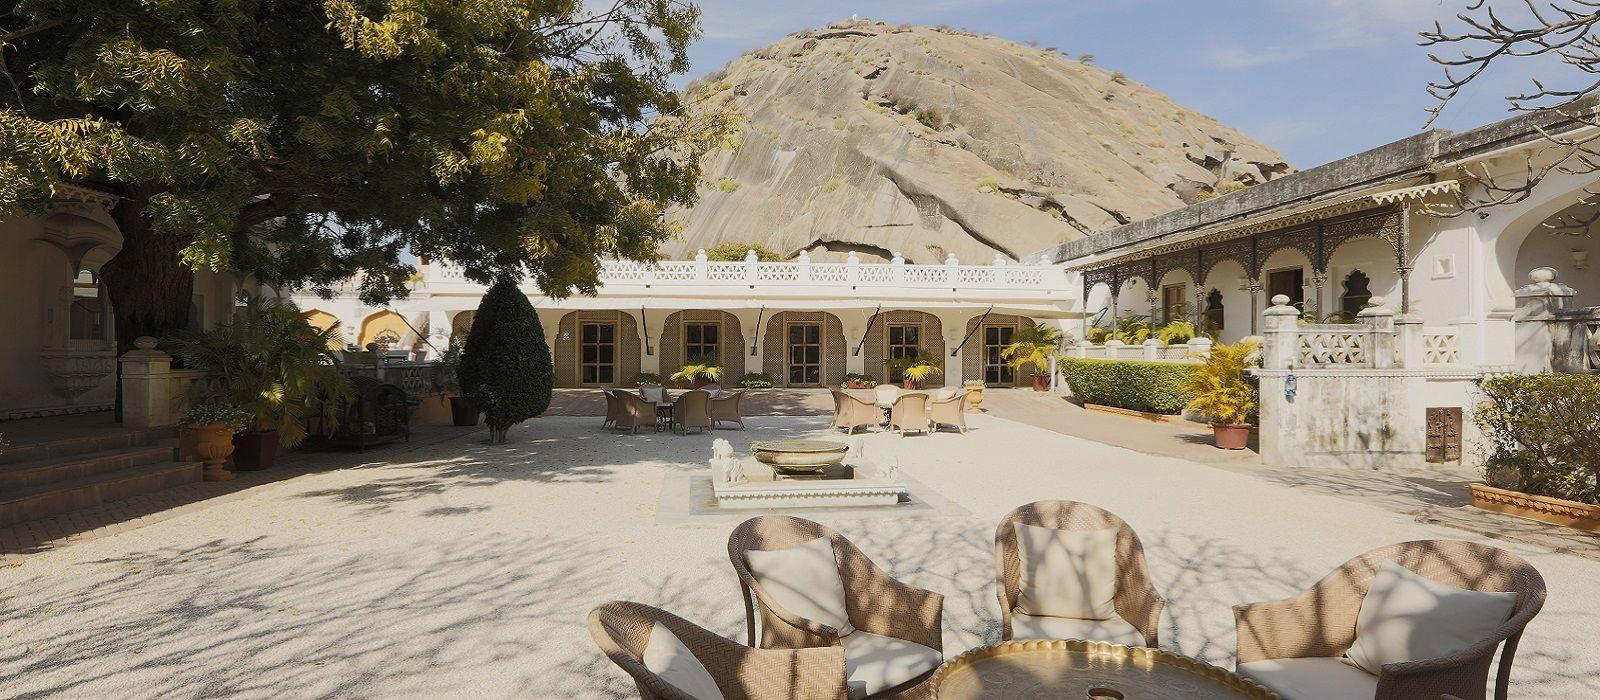 Hotel Rawla Narlai North India